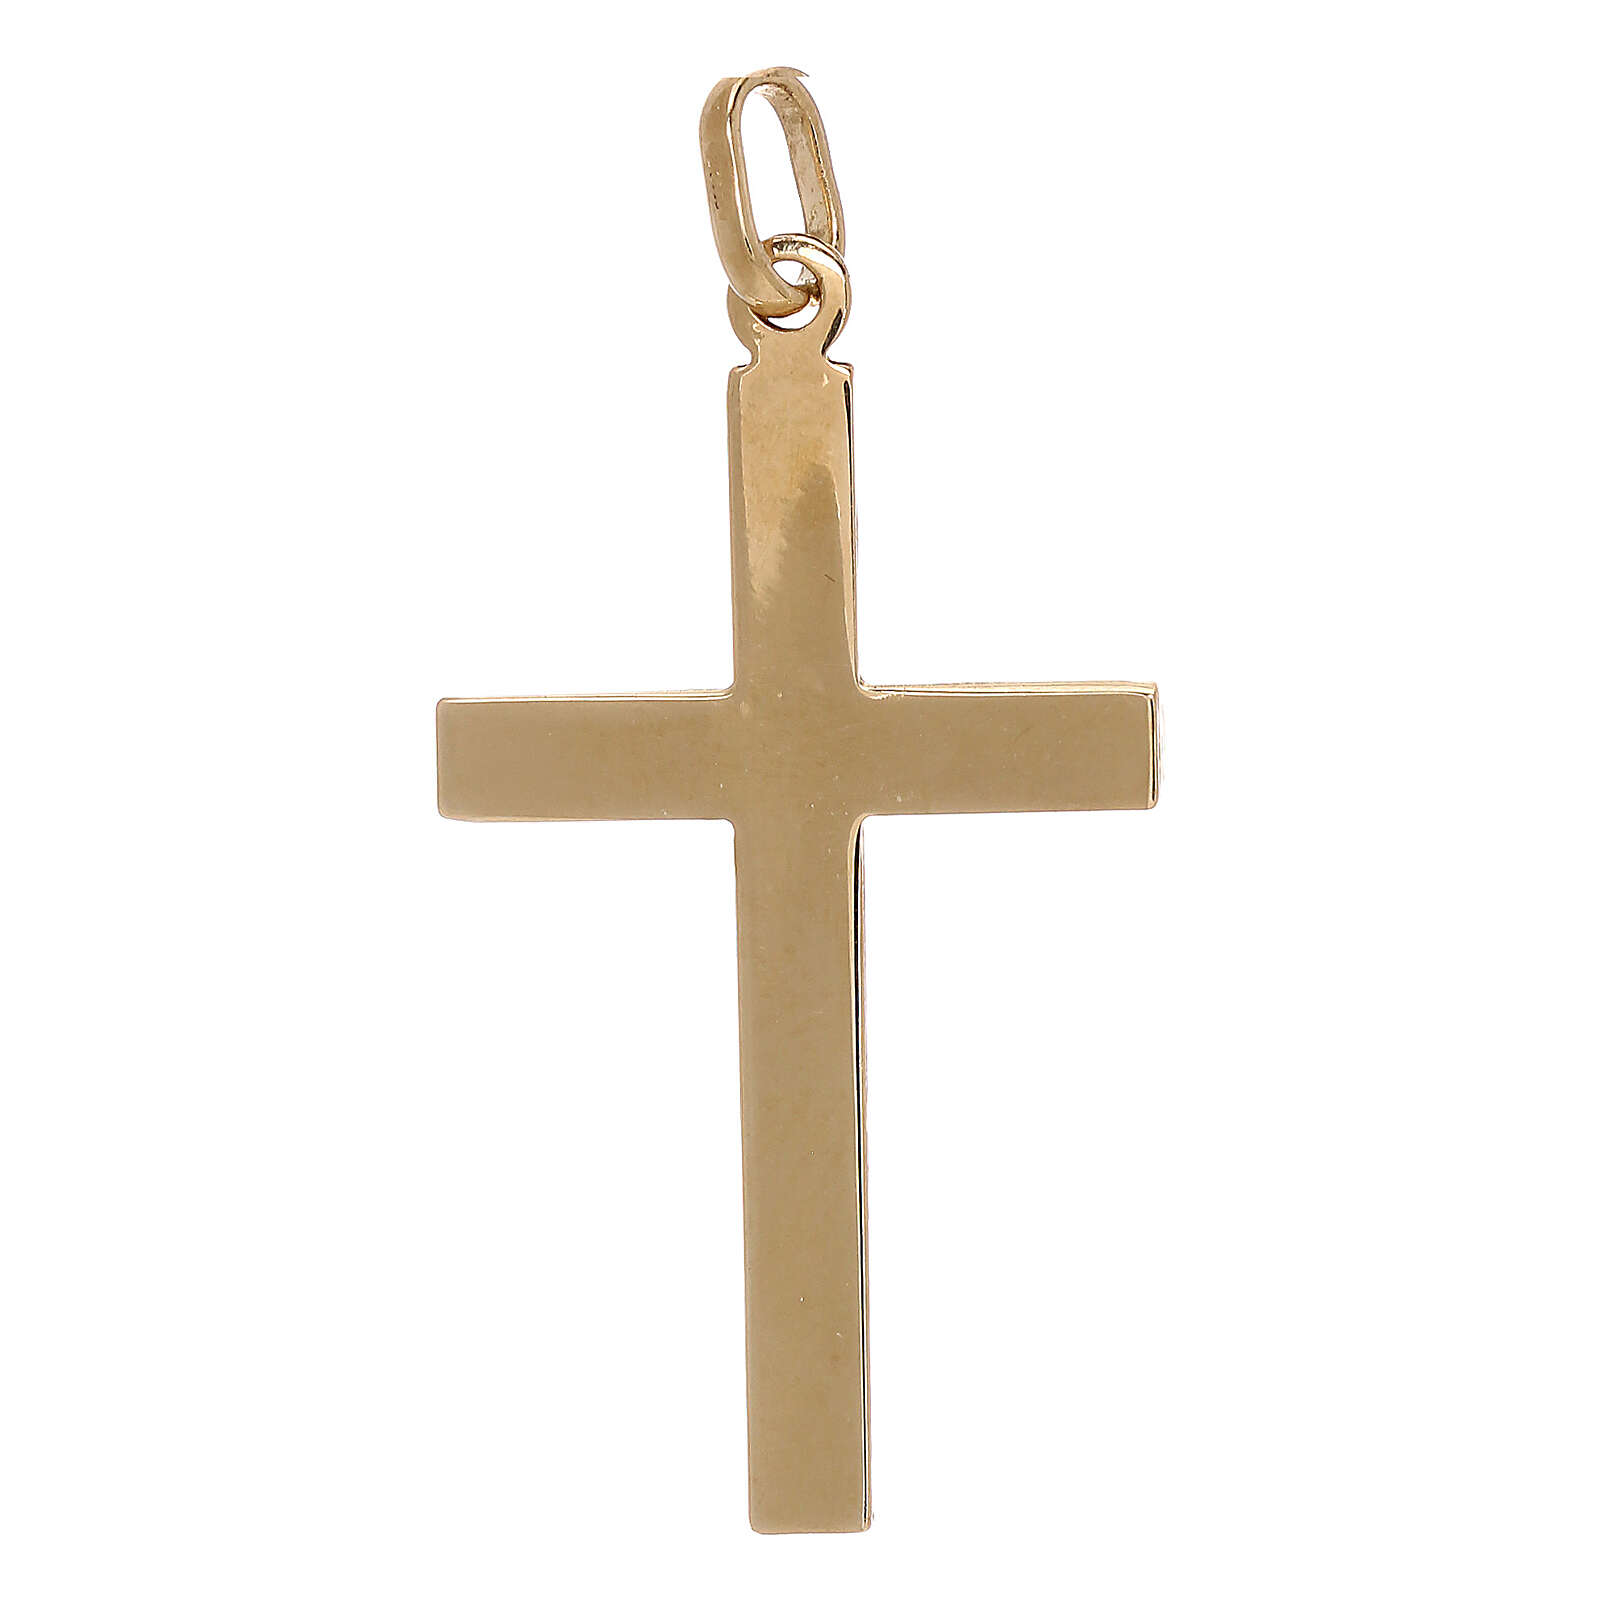 Croce pendente decoro righe oro giallo 750/00 1,1 gr 4